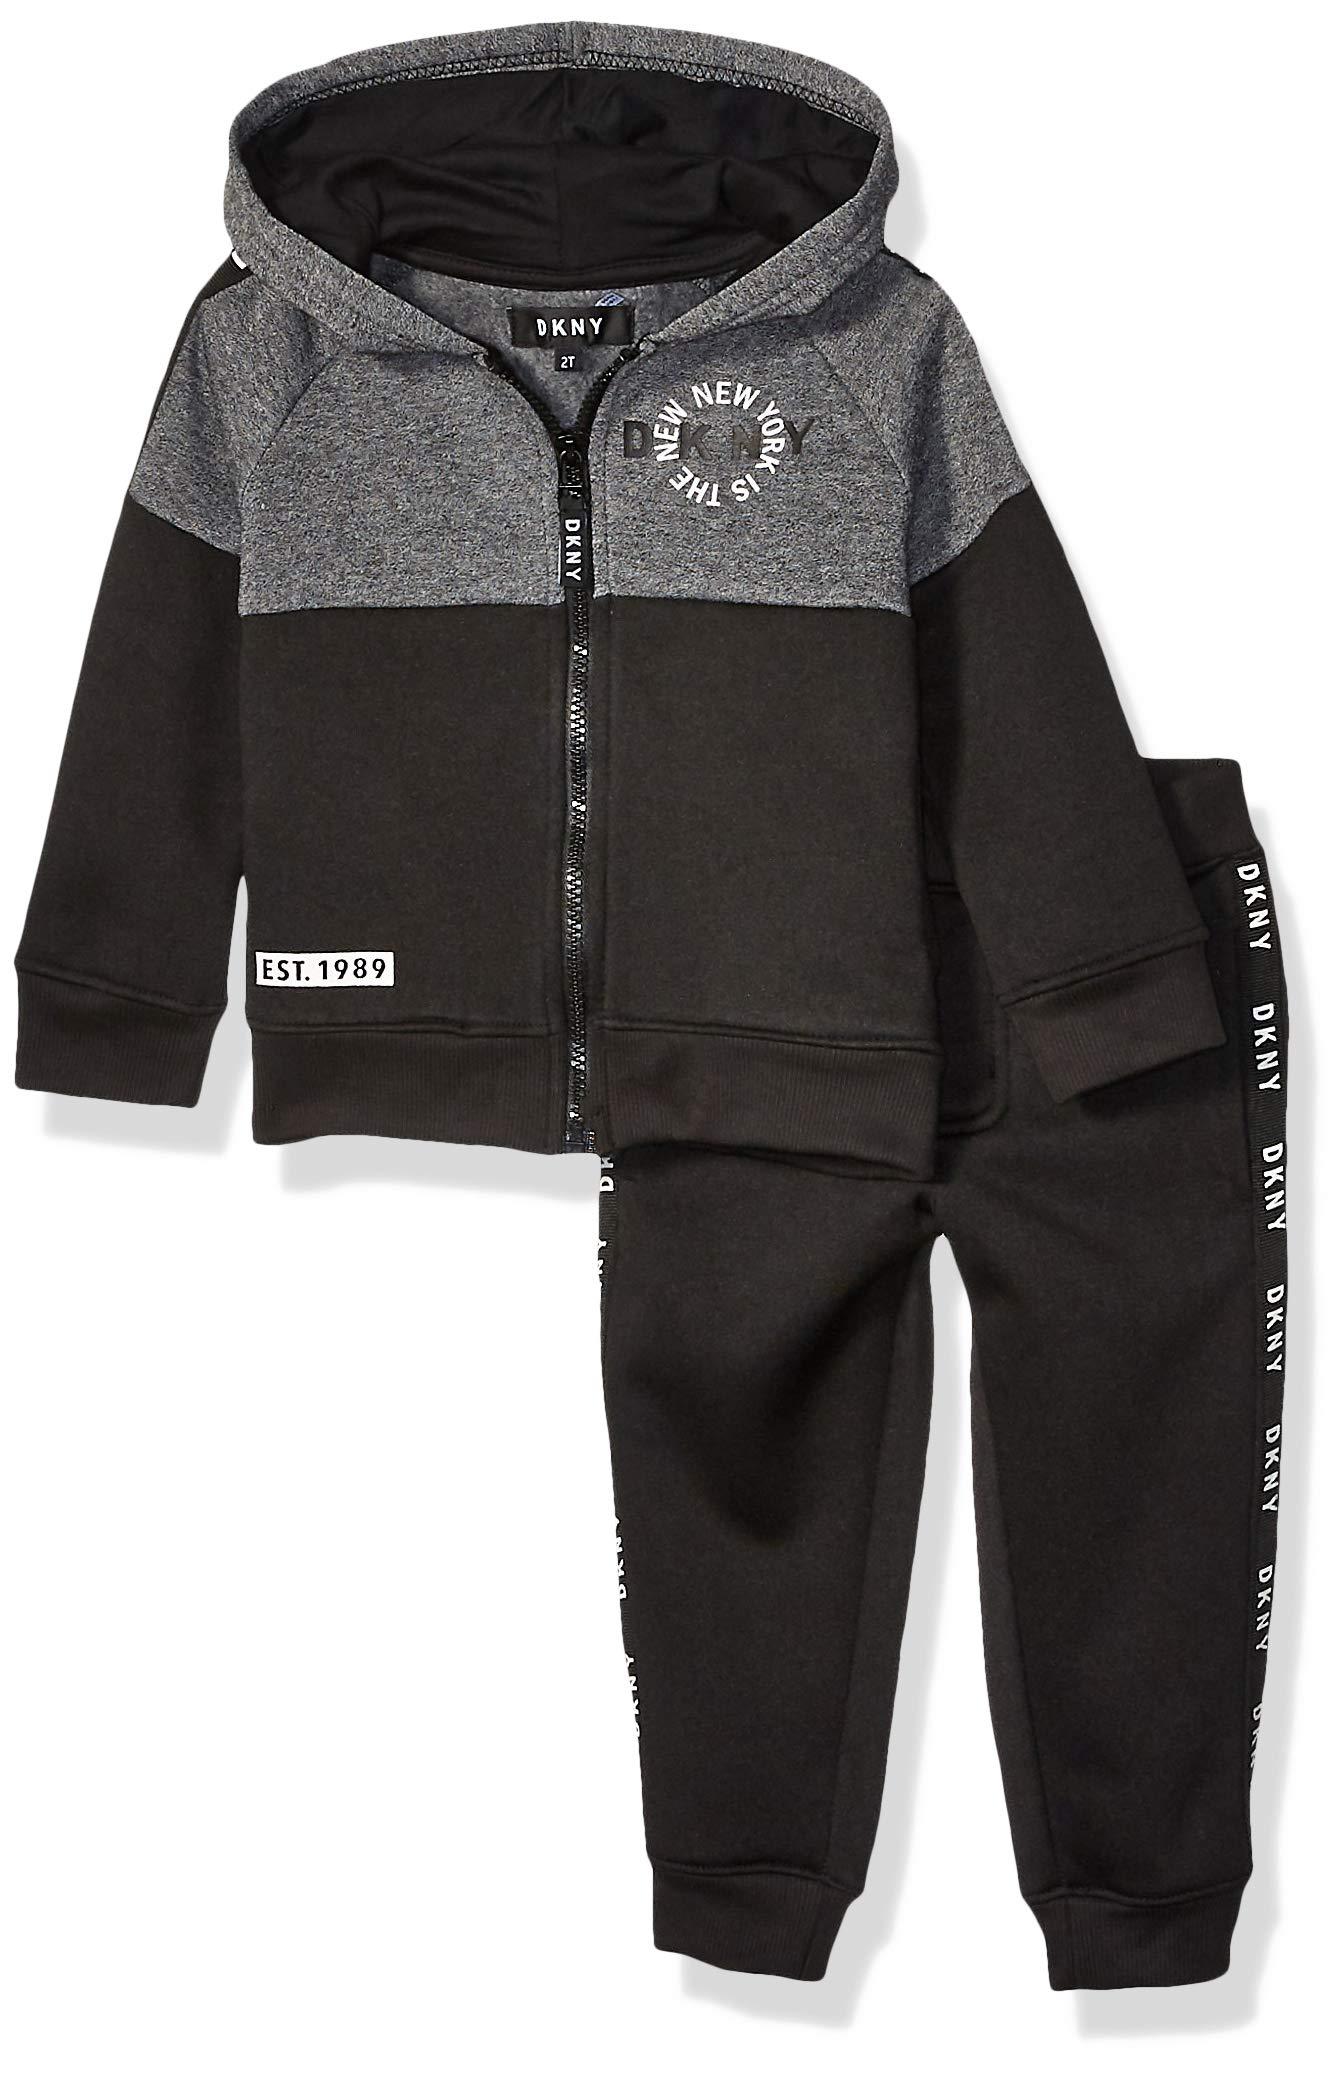 DKNY Boys' New York Fleece Hoody and Jog Pant